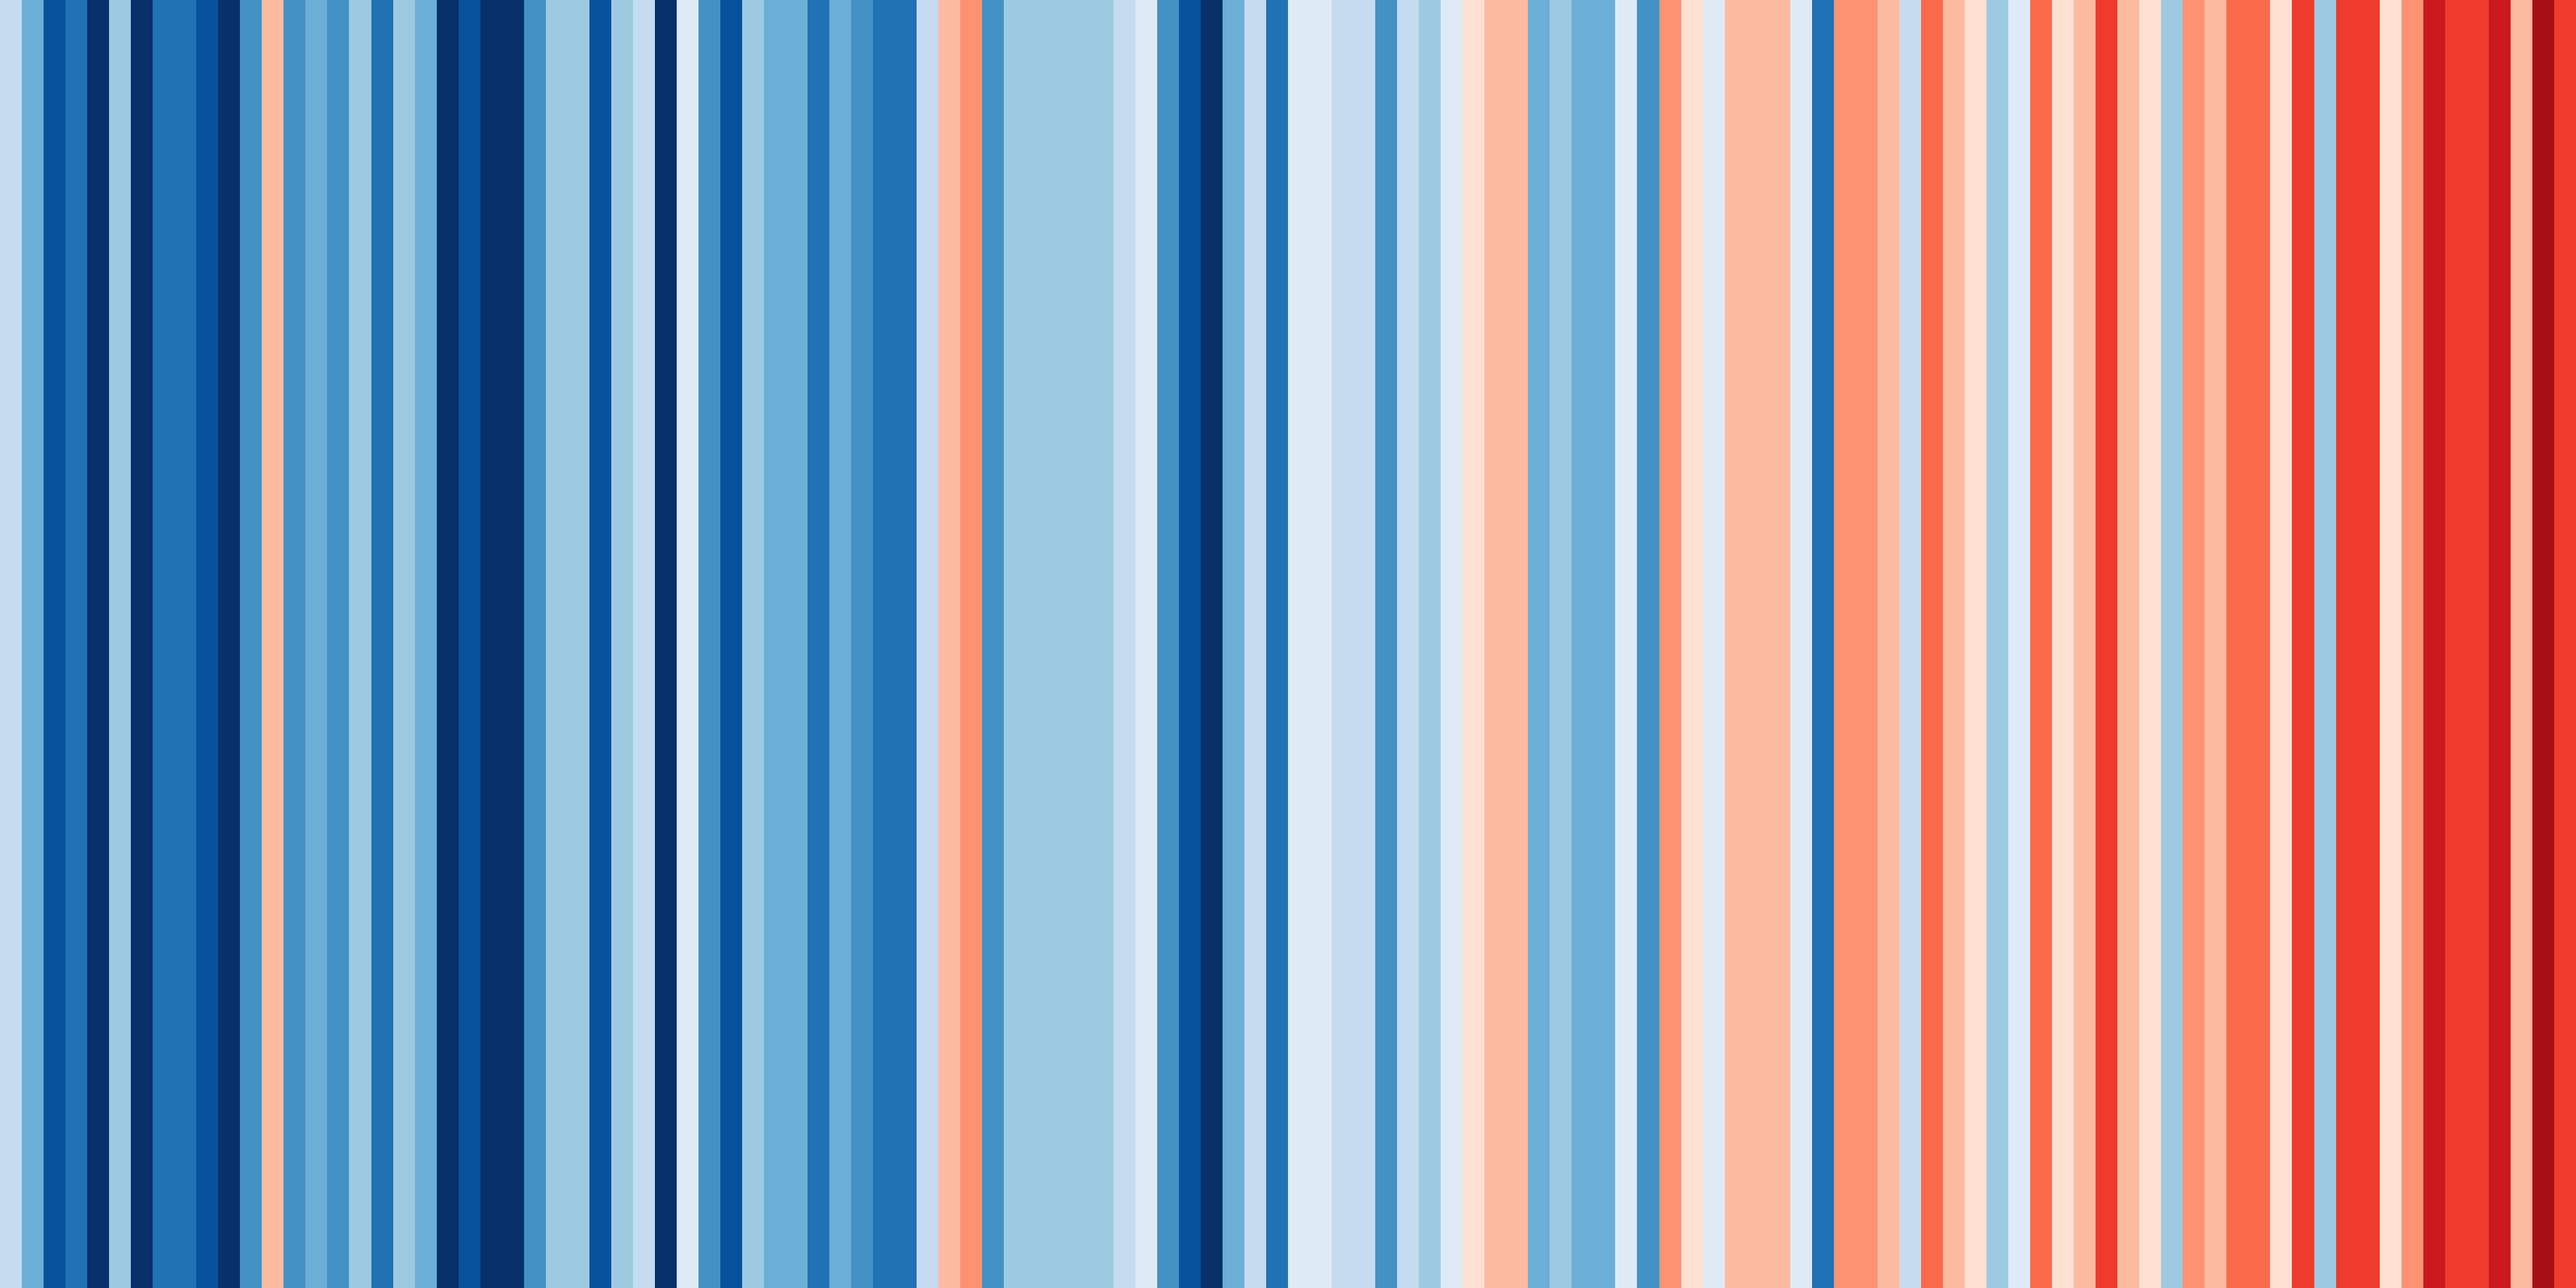 _stripes_south_america-argentina--1901-2018-bk.png